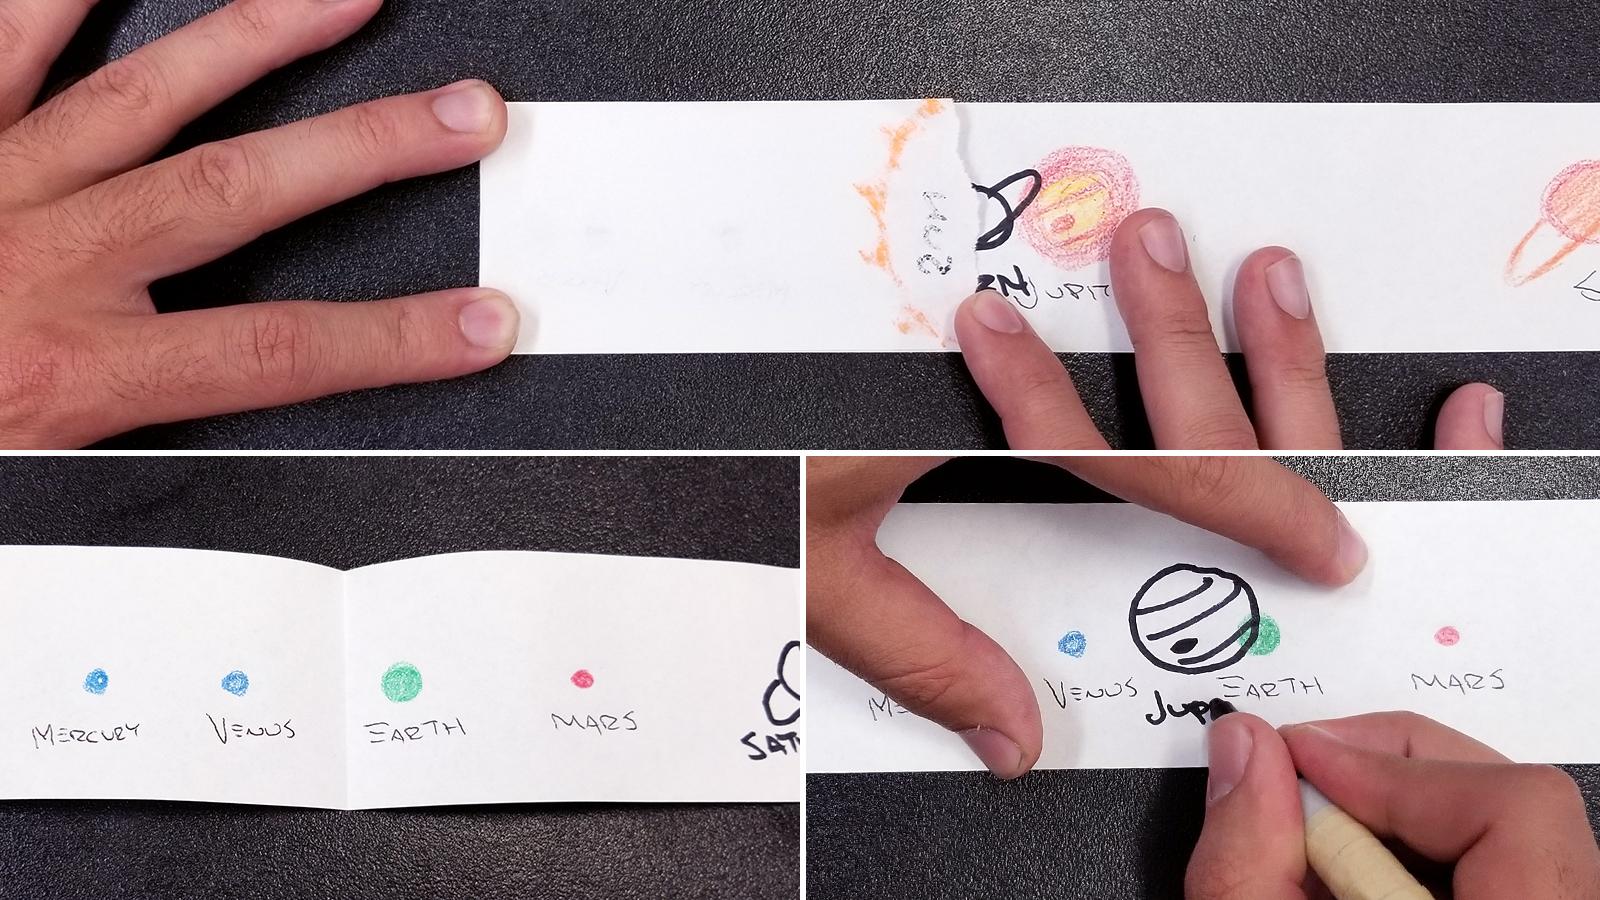 Solar System Scroll Activity - Step 6